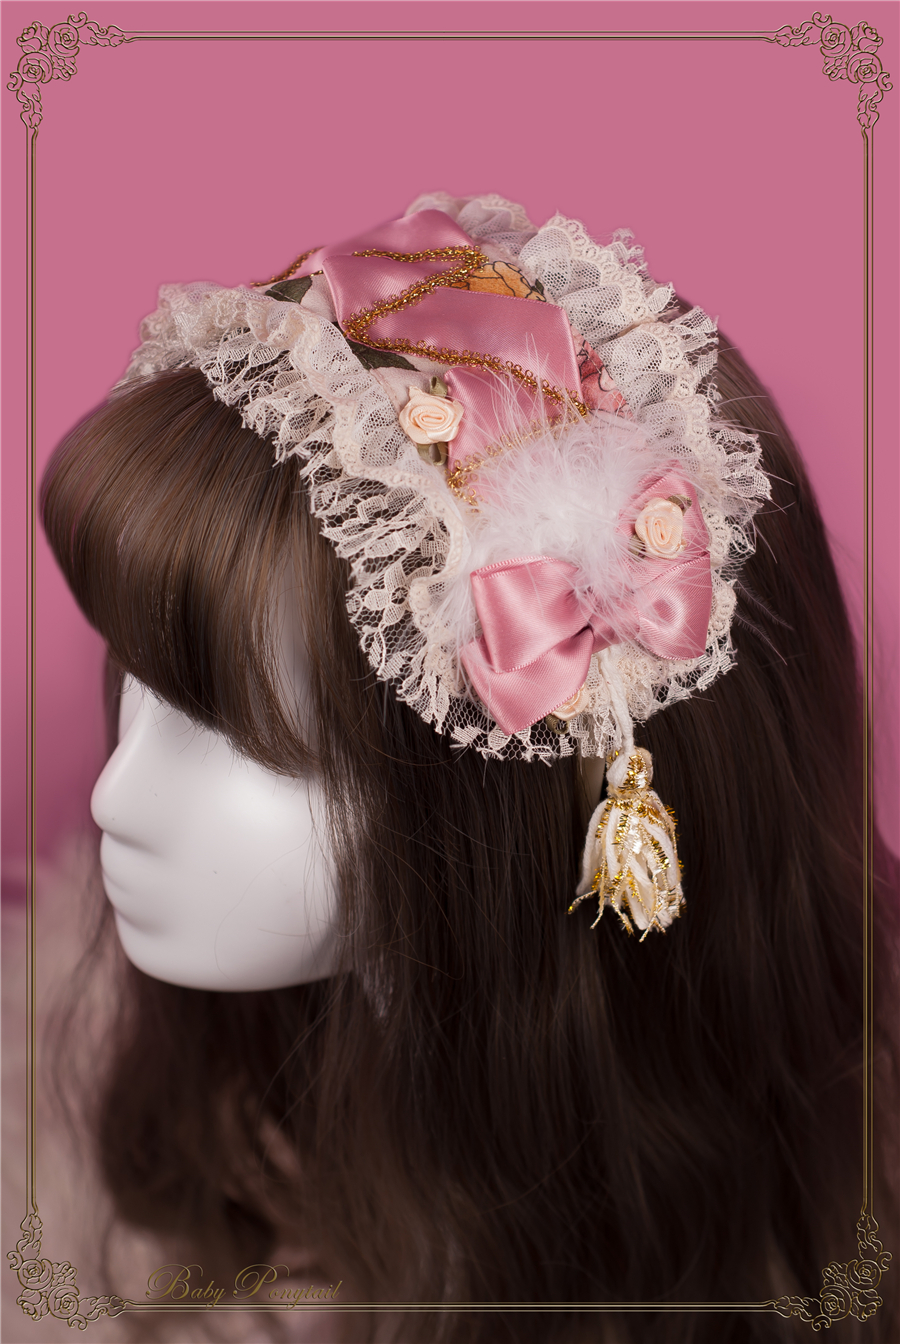 Babyponytail_Accessory_Tassel Head Dress_2.jpg